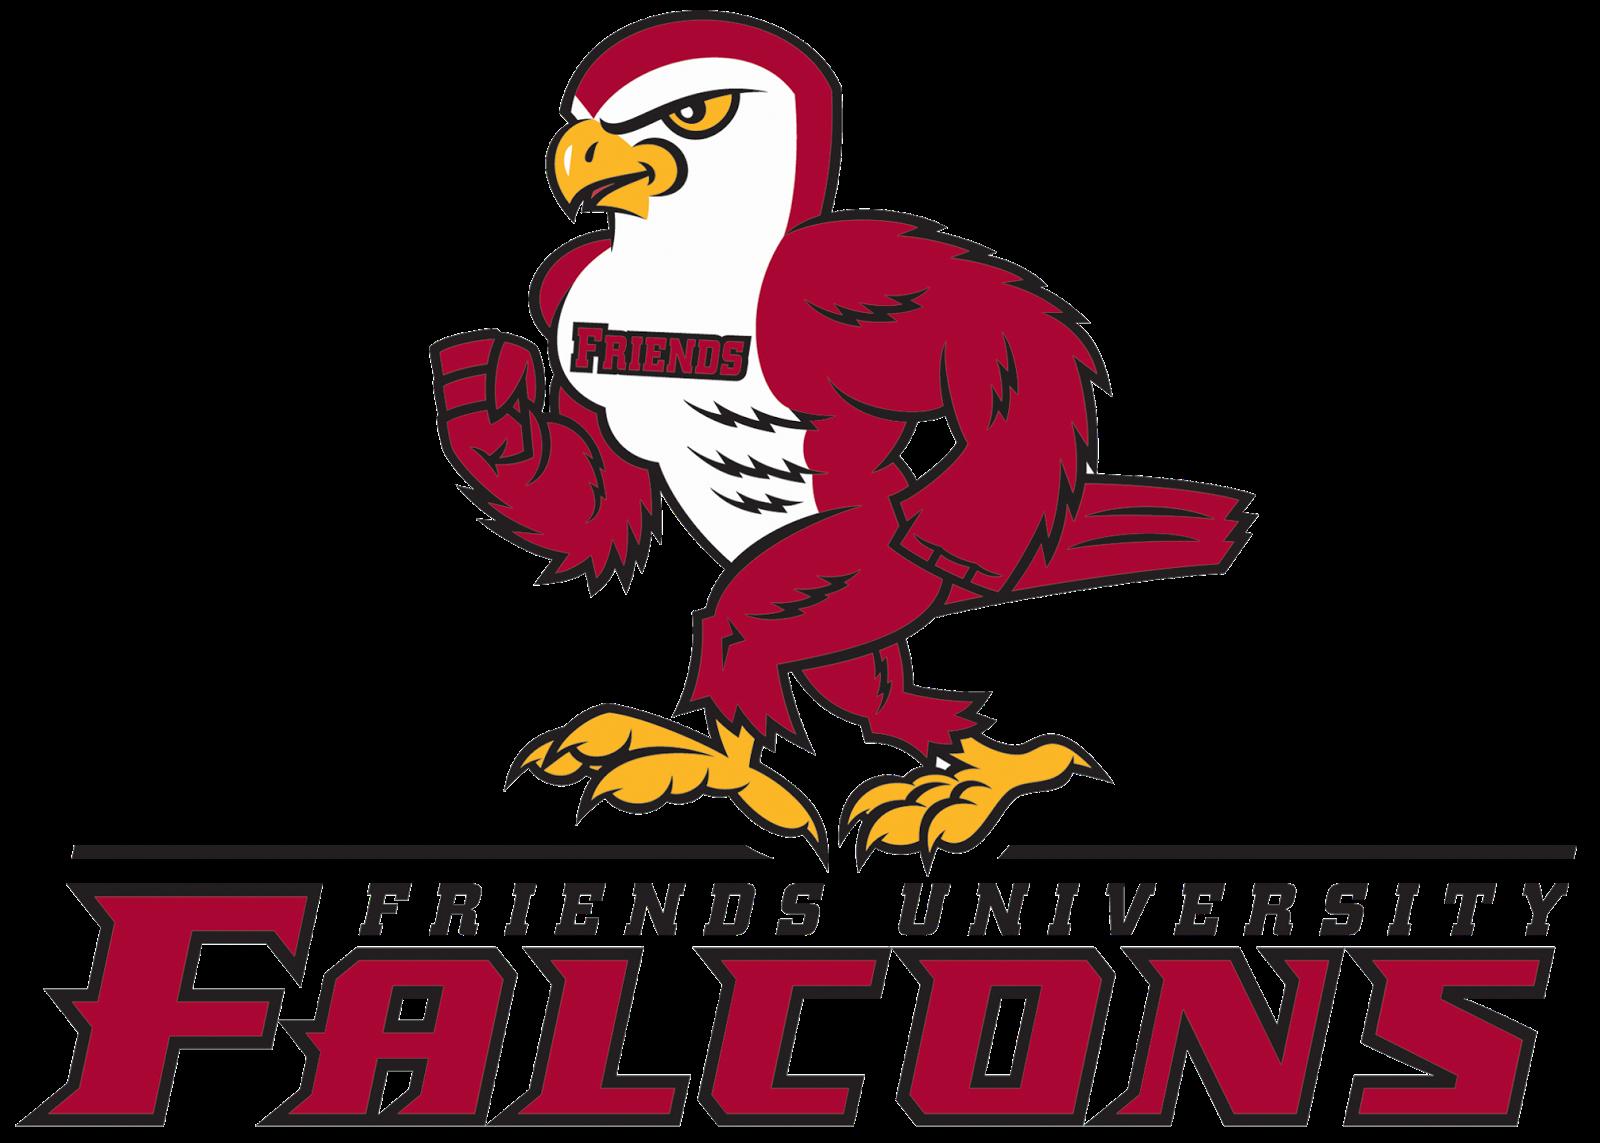 Falcons Friends University Wichita Kansas Div Ii Kansas Collegiate Athletic Conference Falcons Wichita Naia College Logo University Logo Sports Logo